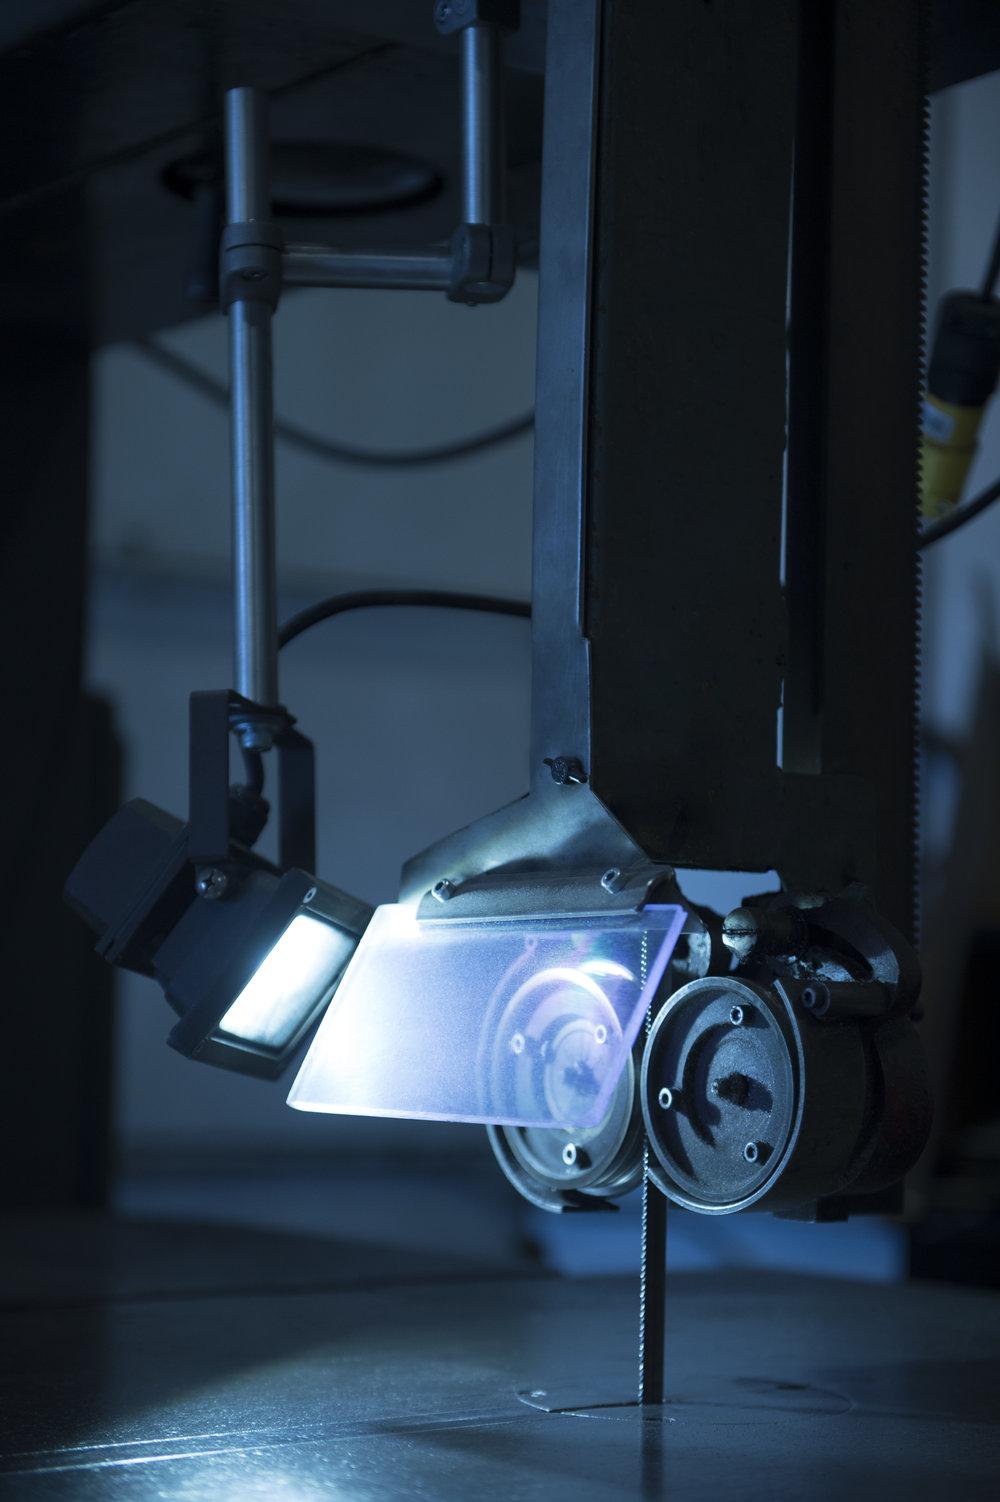 Marta-Hewson-industrial-photography-precision-machines-Kitestring-VTR-Bowlfeeders.jpg